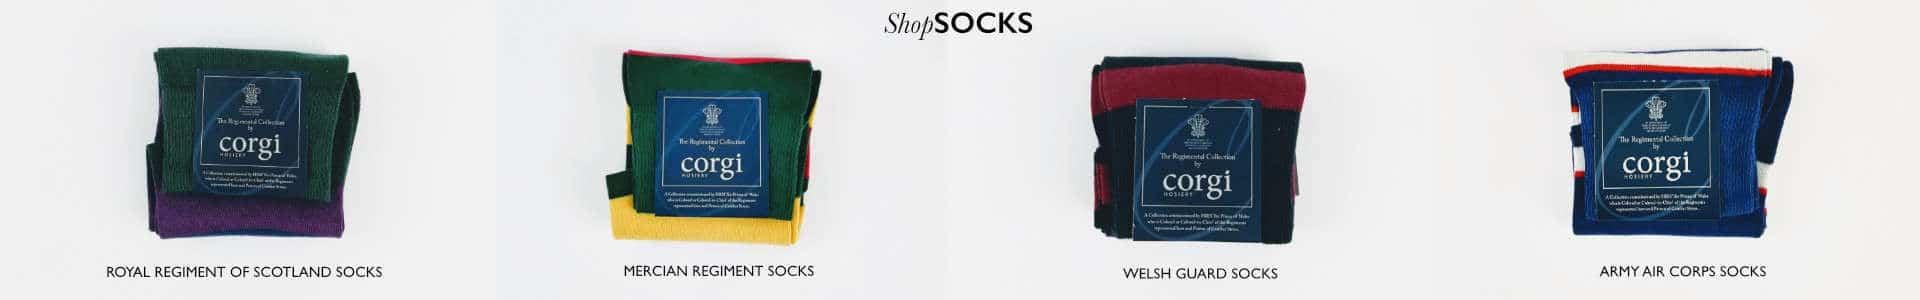 1920 regimantal sock ad 1 - British National Symbols